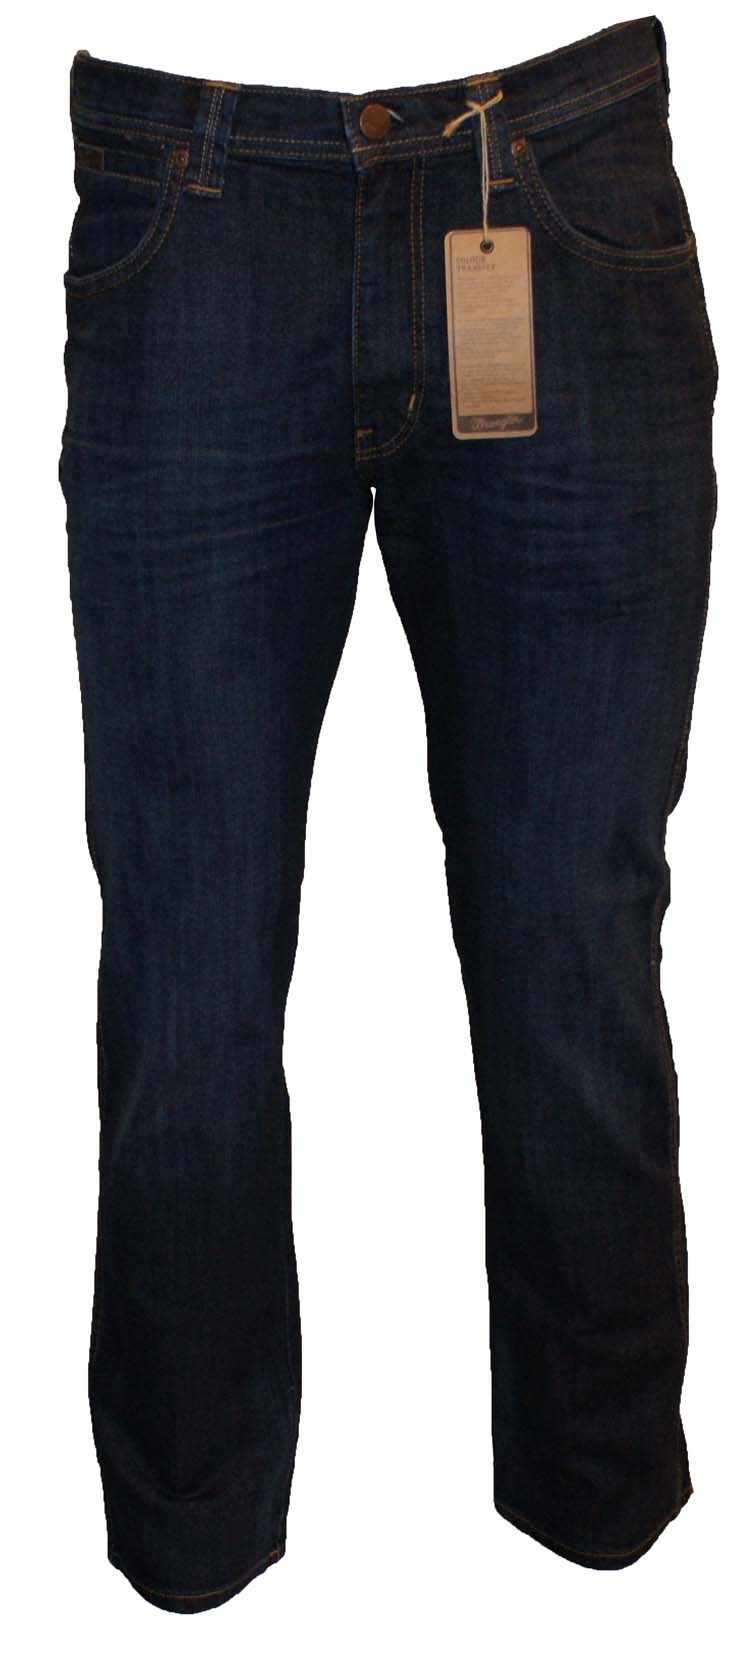 "Wrangler stretch jeans "" Arizona "" Ultra dark"